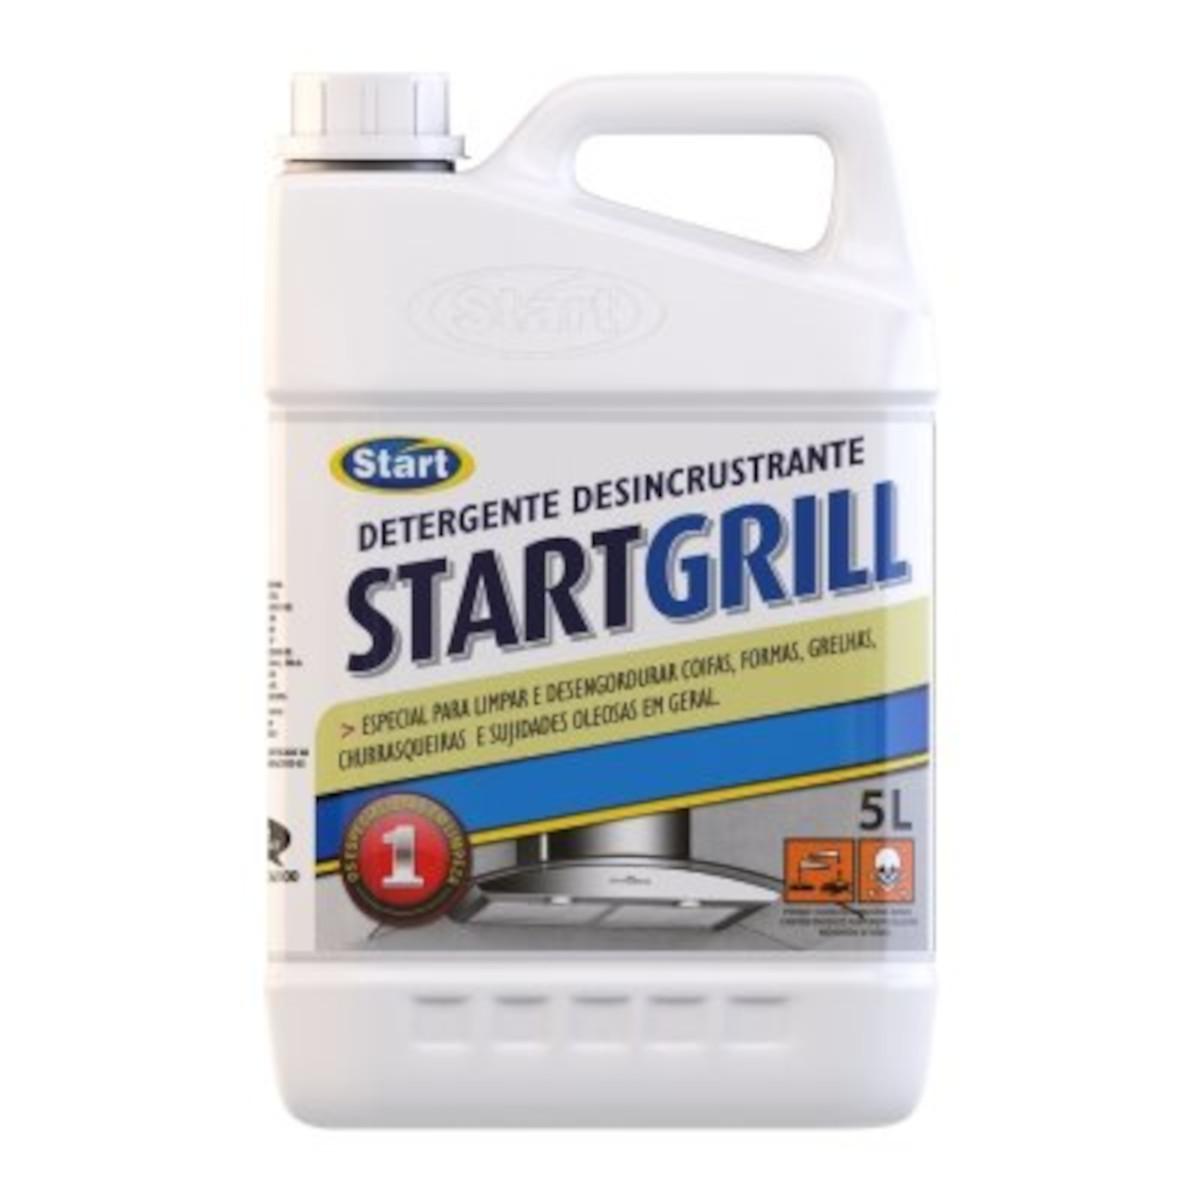 Desincrustante alcalino 5Litros StartGrill galão GL